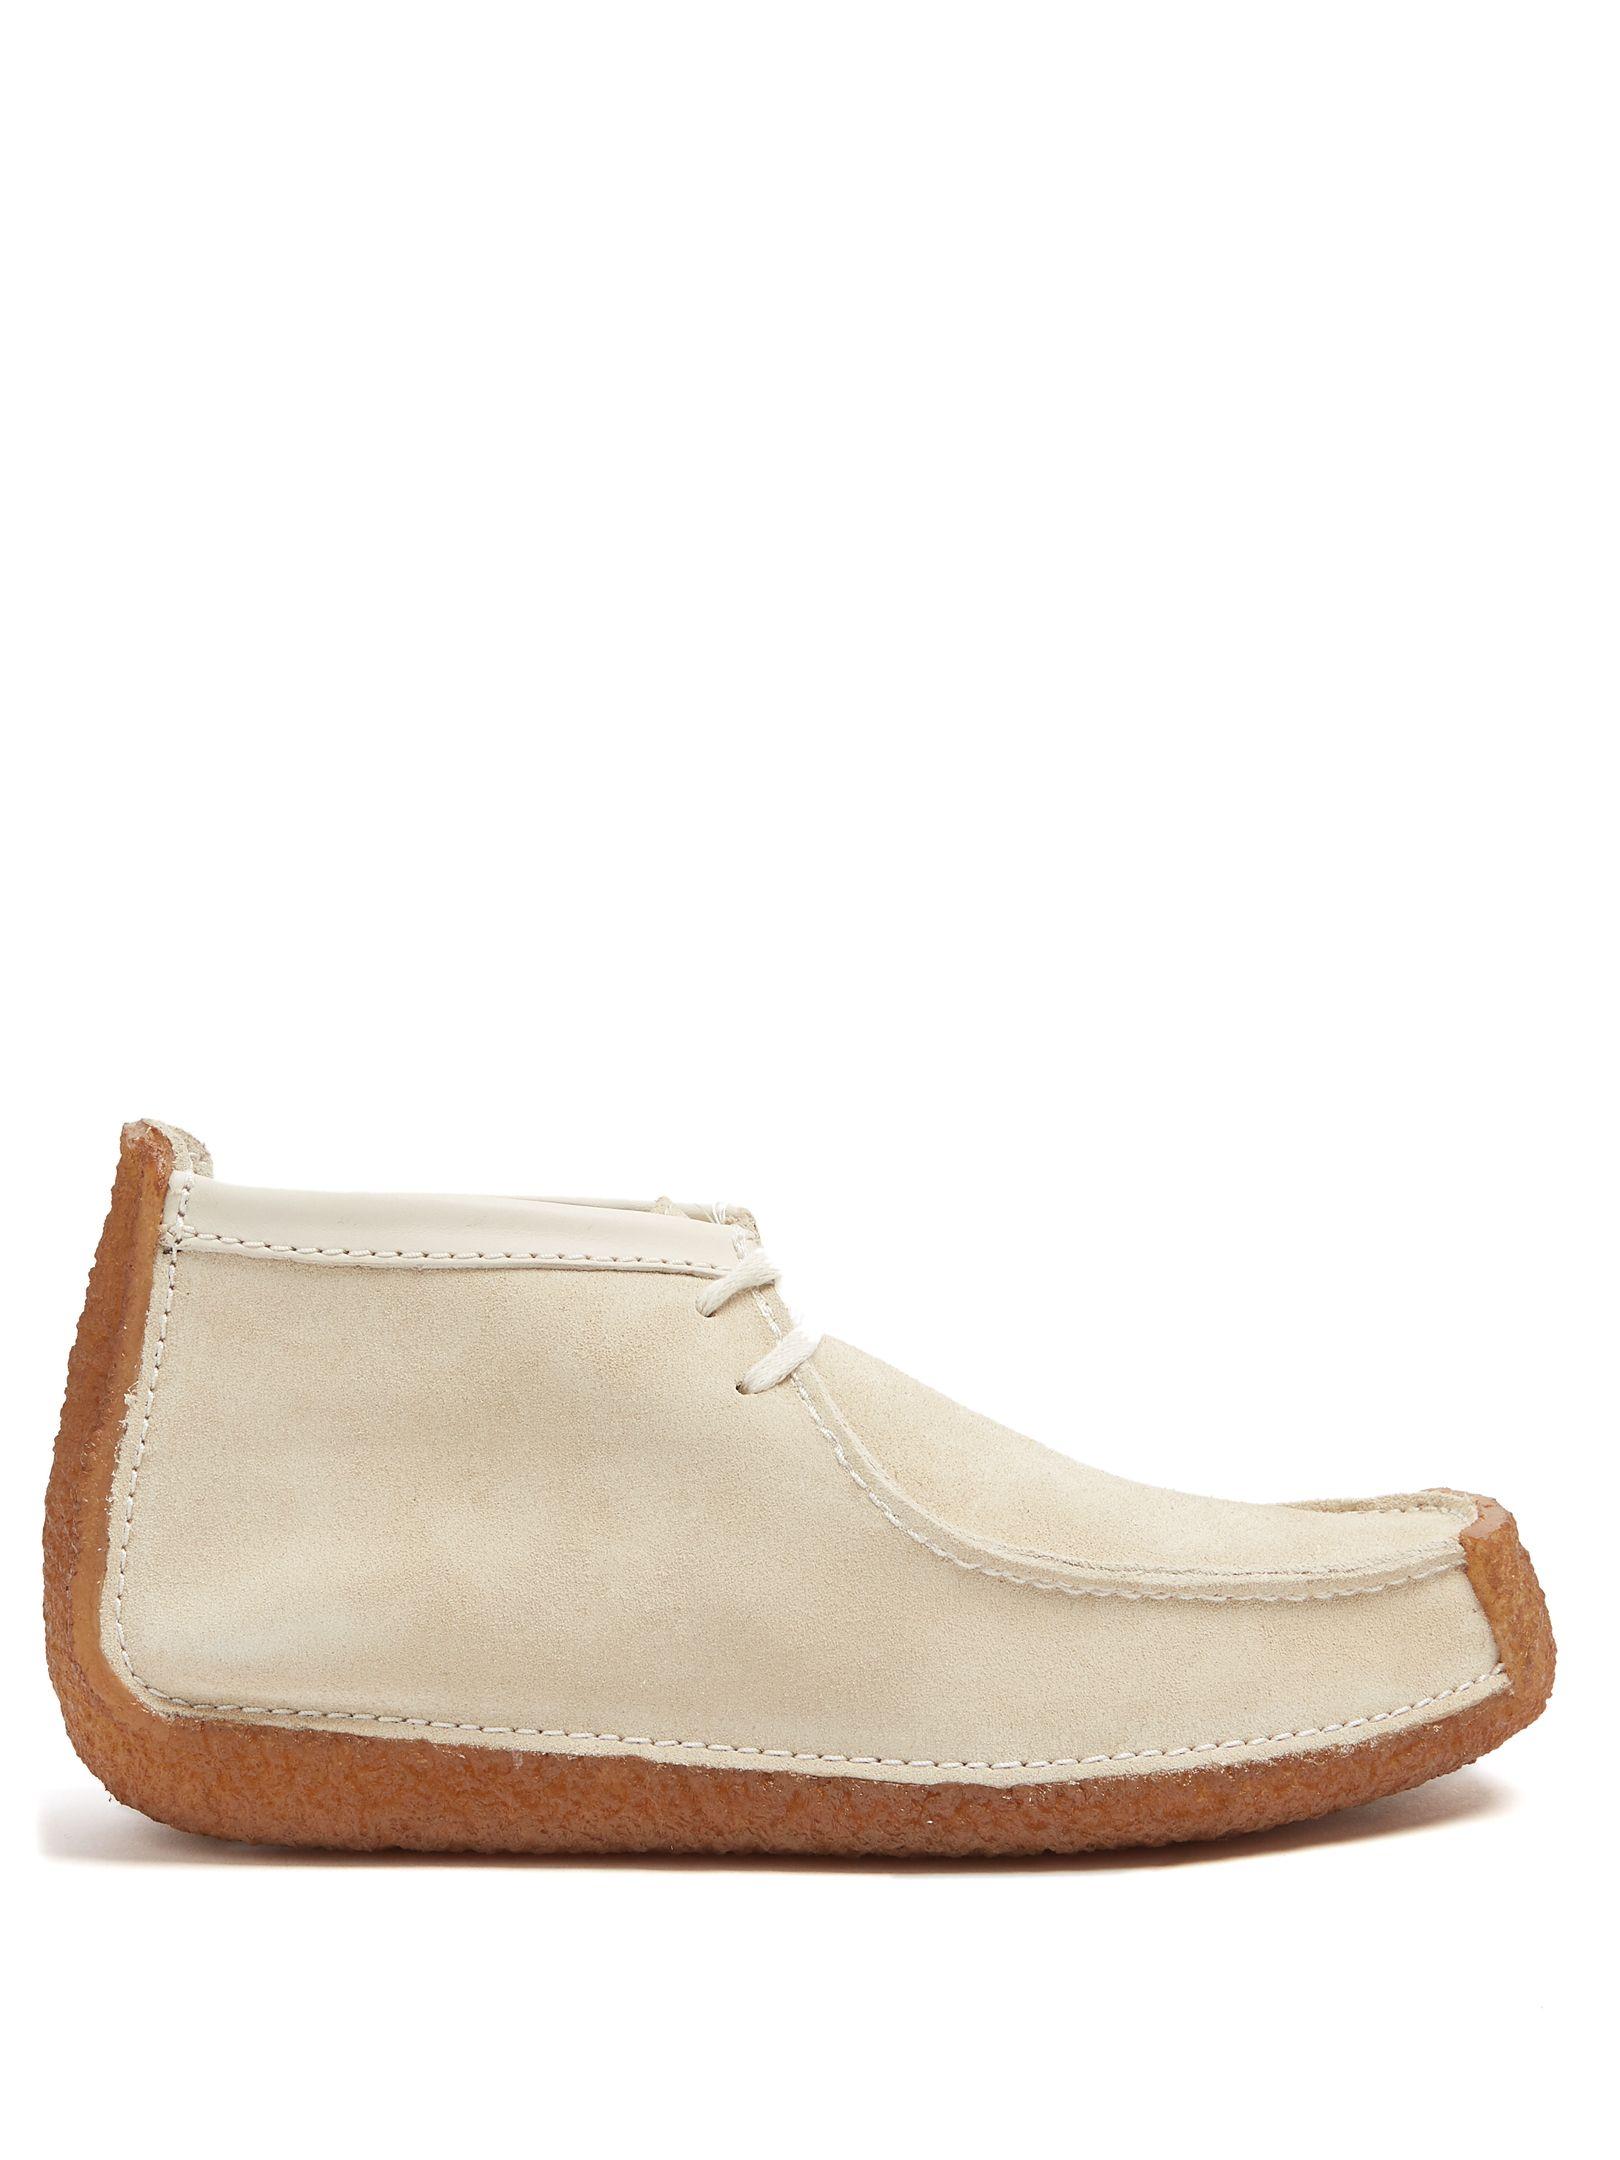 LEMAIRE Suede Clarks Originals Edition Redland Desert Boots